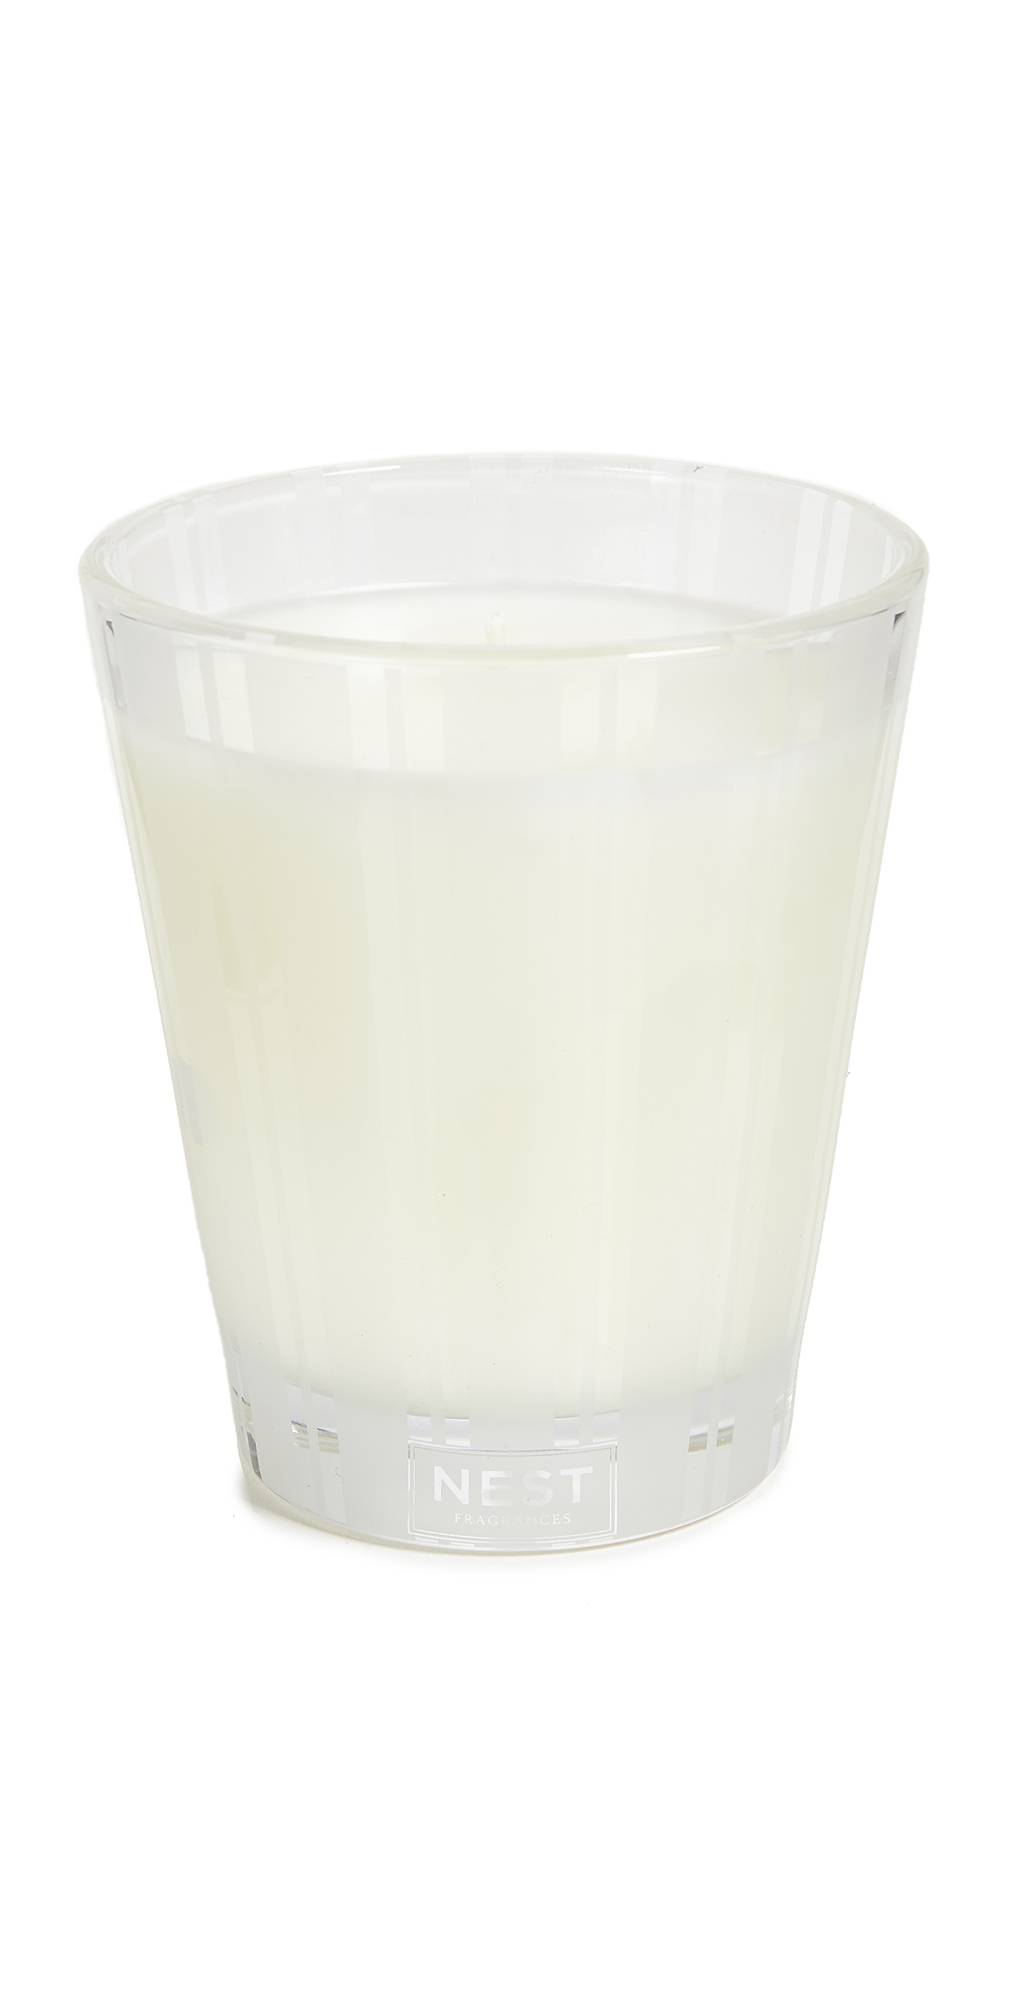 Nest Fragrance Classic Candle Ocean Mist & Sea Salt Scent  - Size: One Size